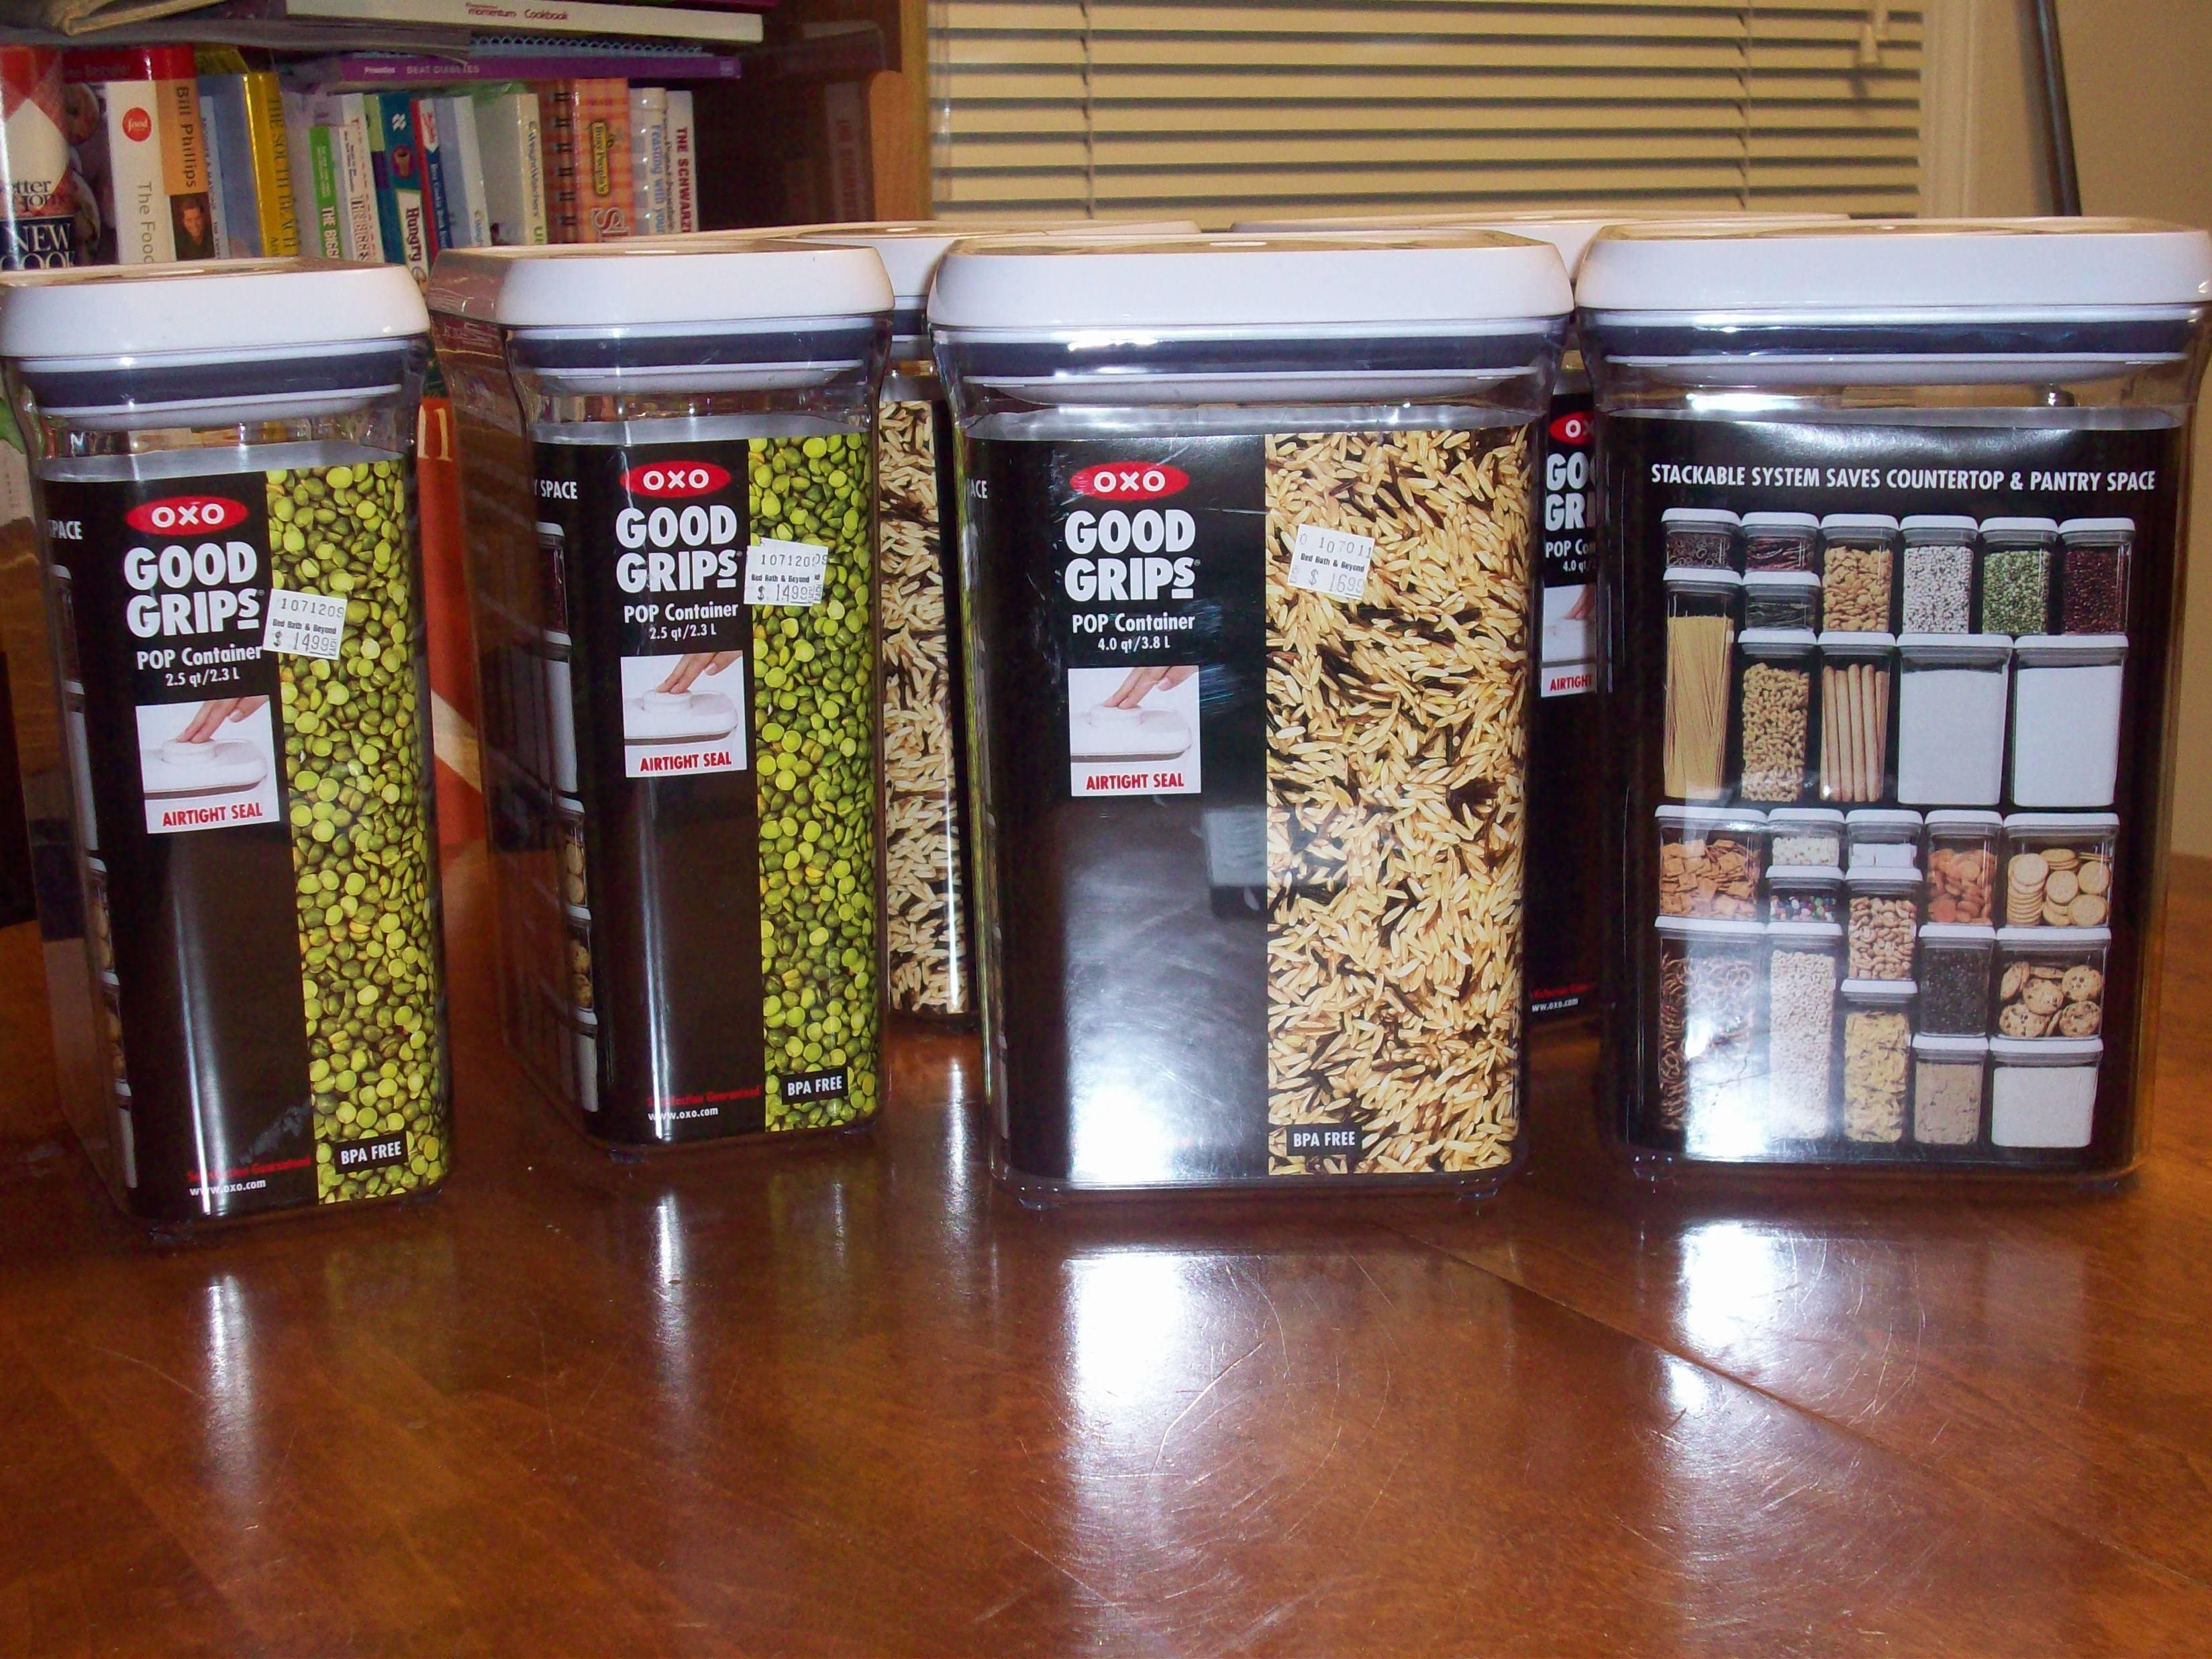 Best Kitchen Gallery: Kitchen Organization Downsized of Grain Storage Containers Home  on rachelxblog.com